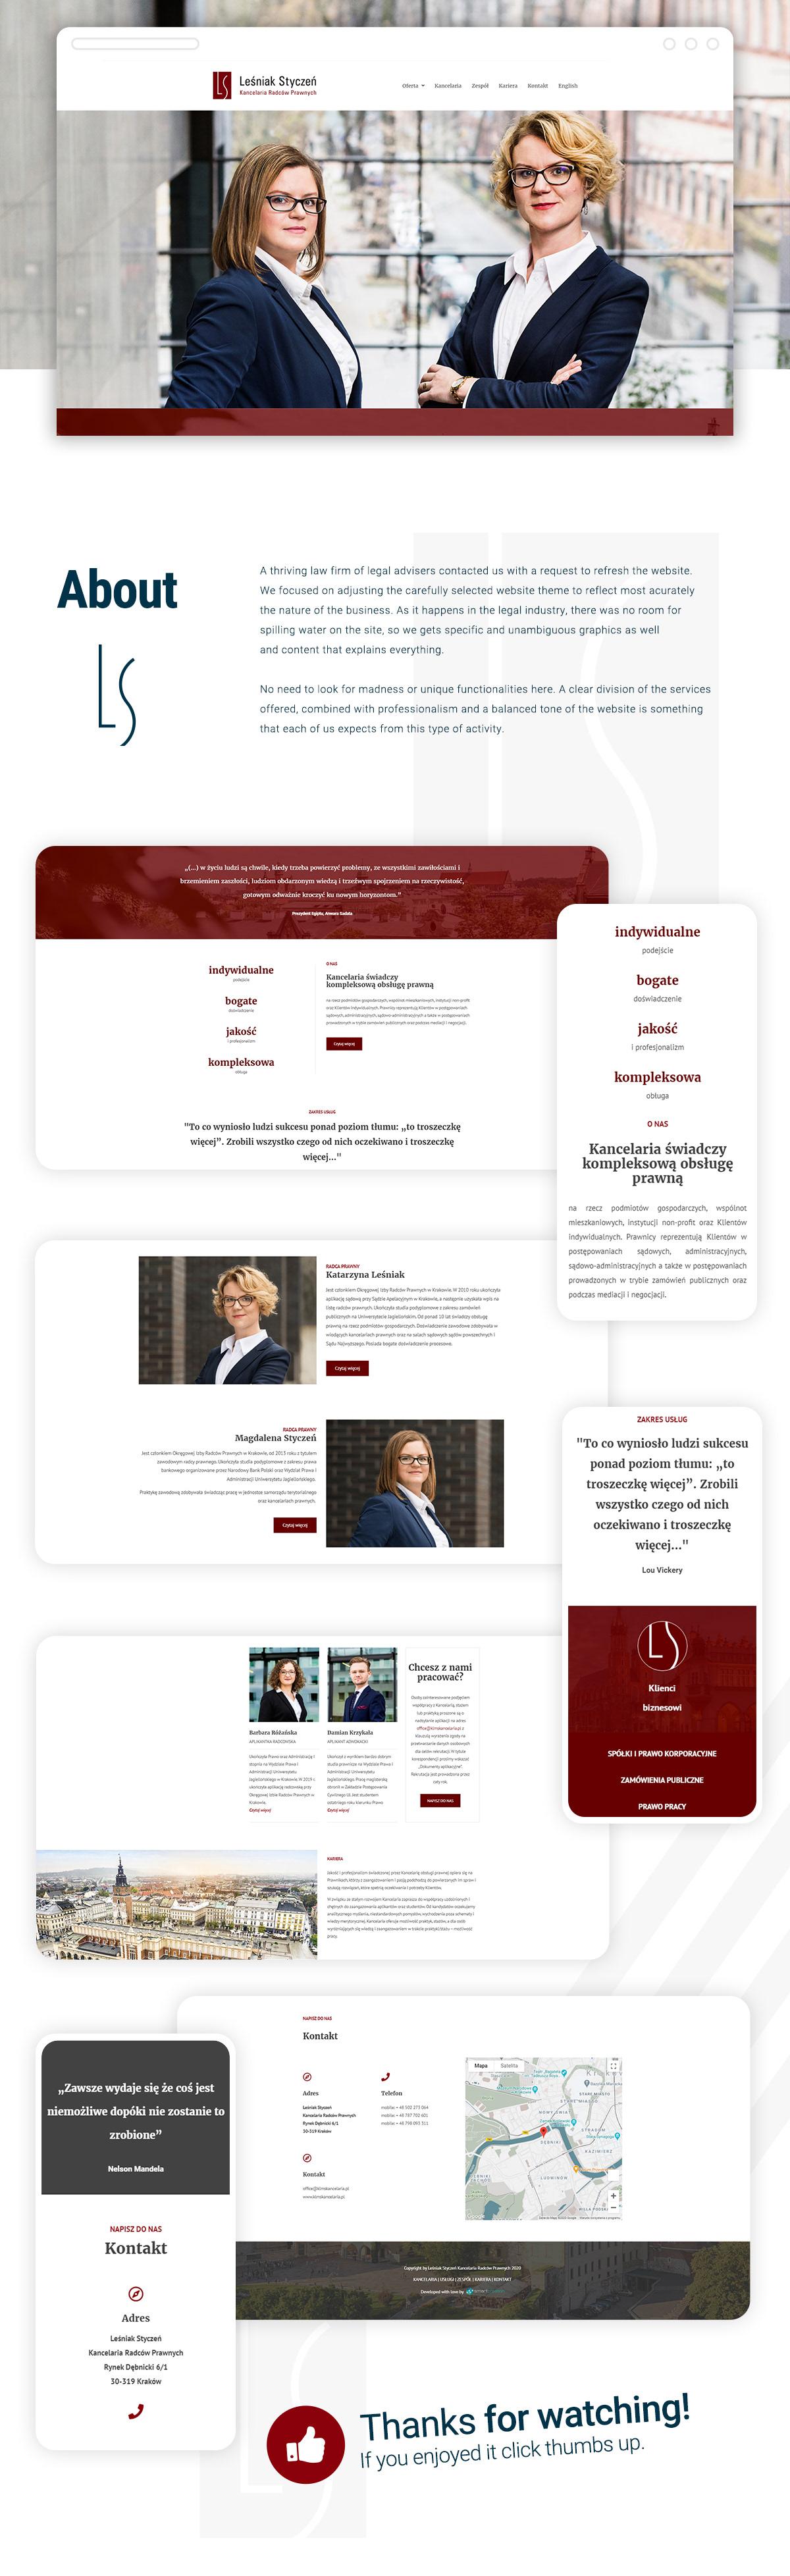 adviser elegant Justice law light minimalistic mobile red simple